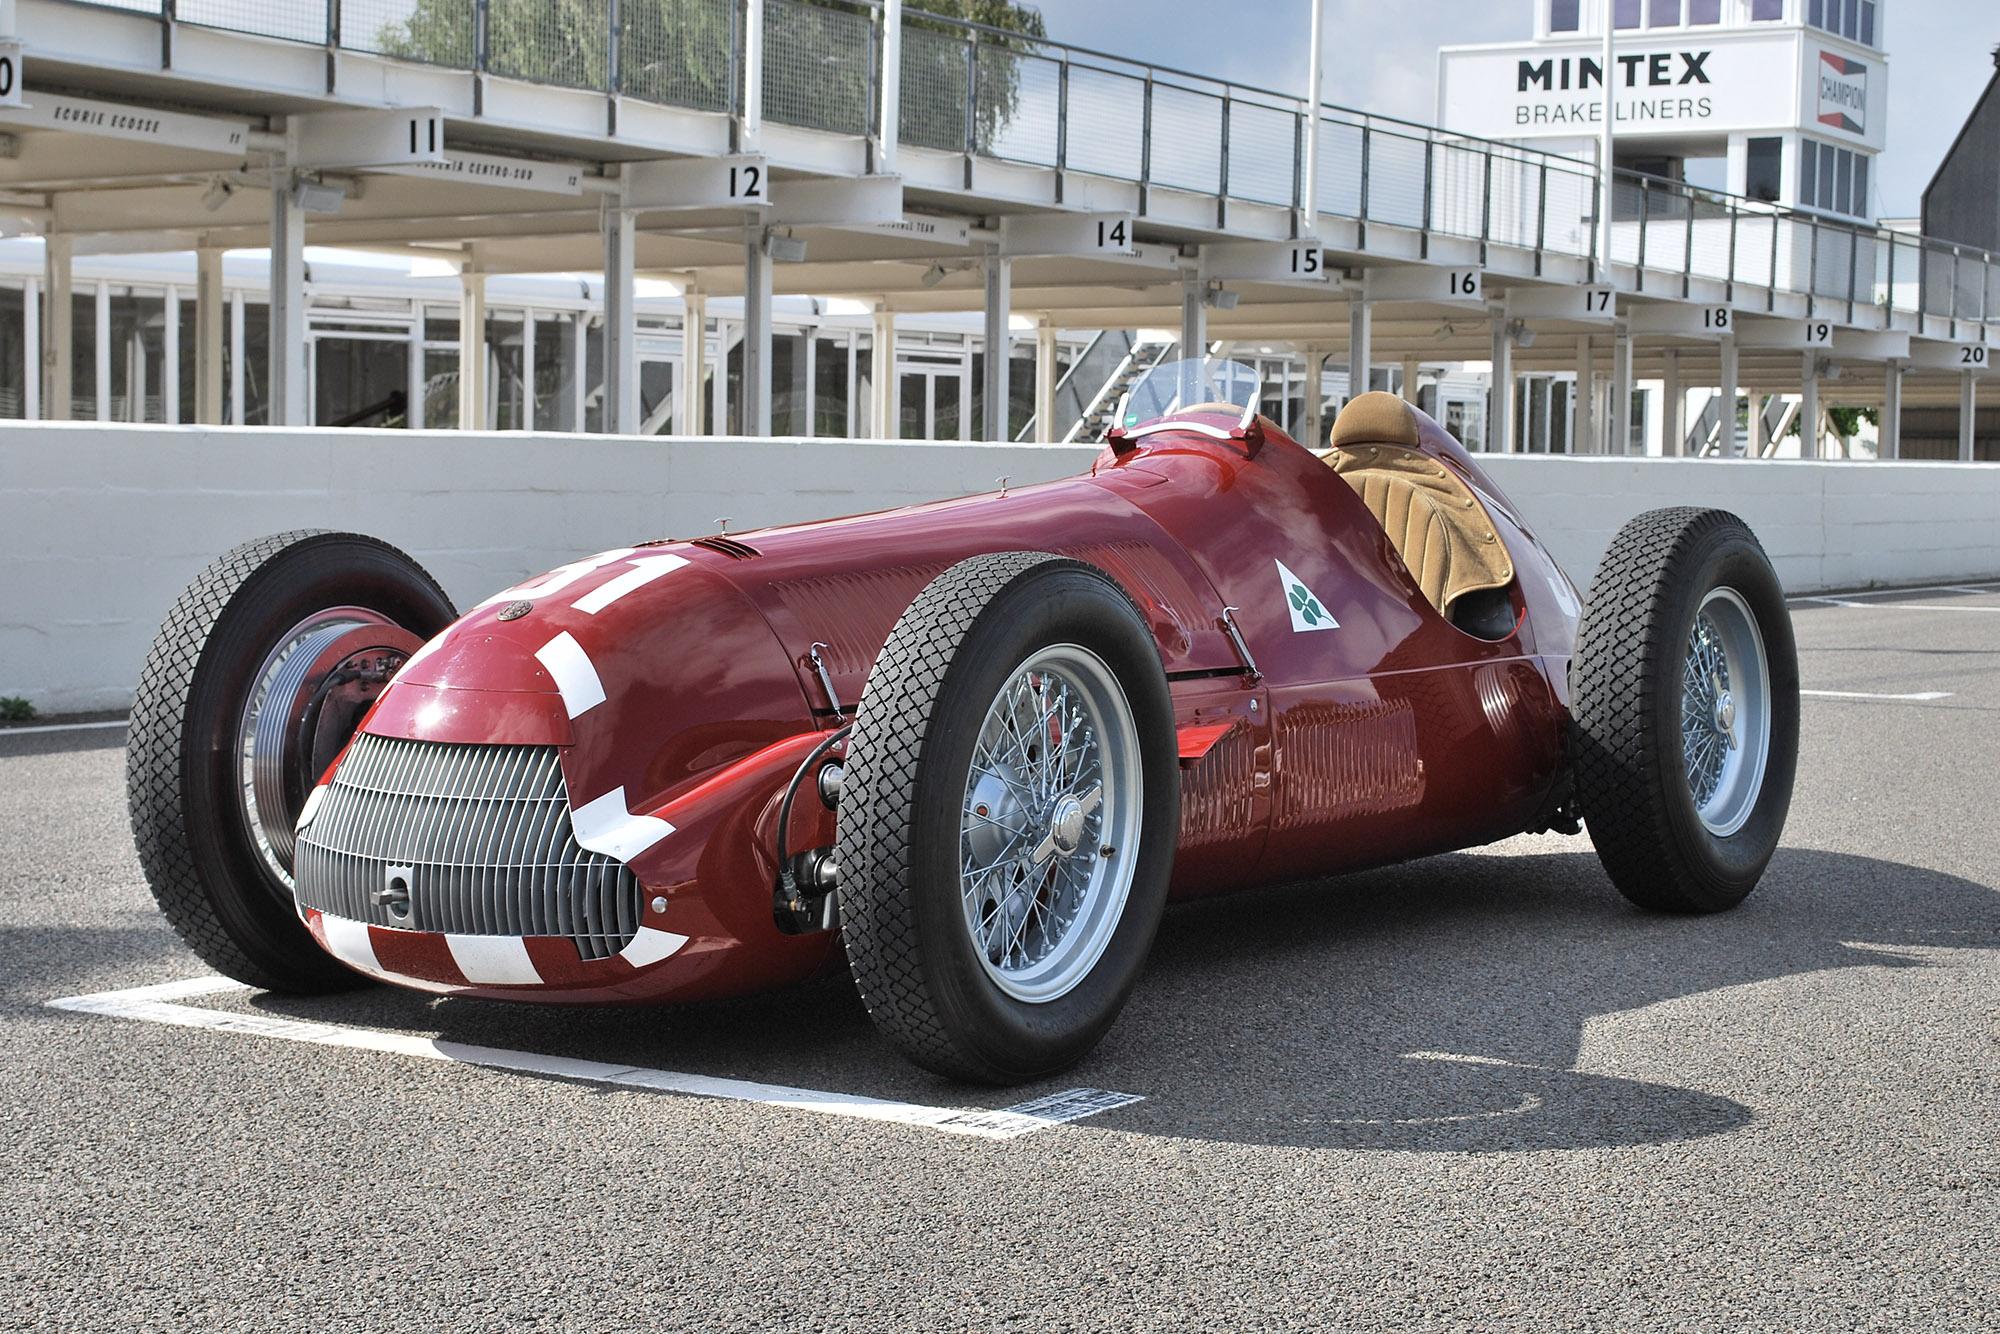 Alfa 158 testing at Goodwood